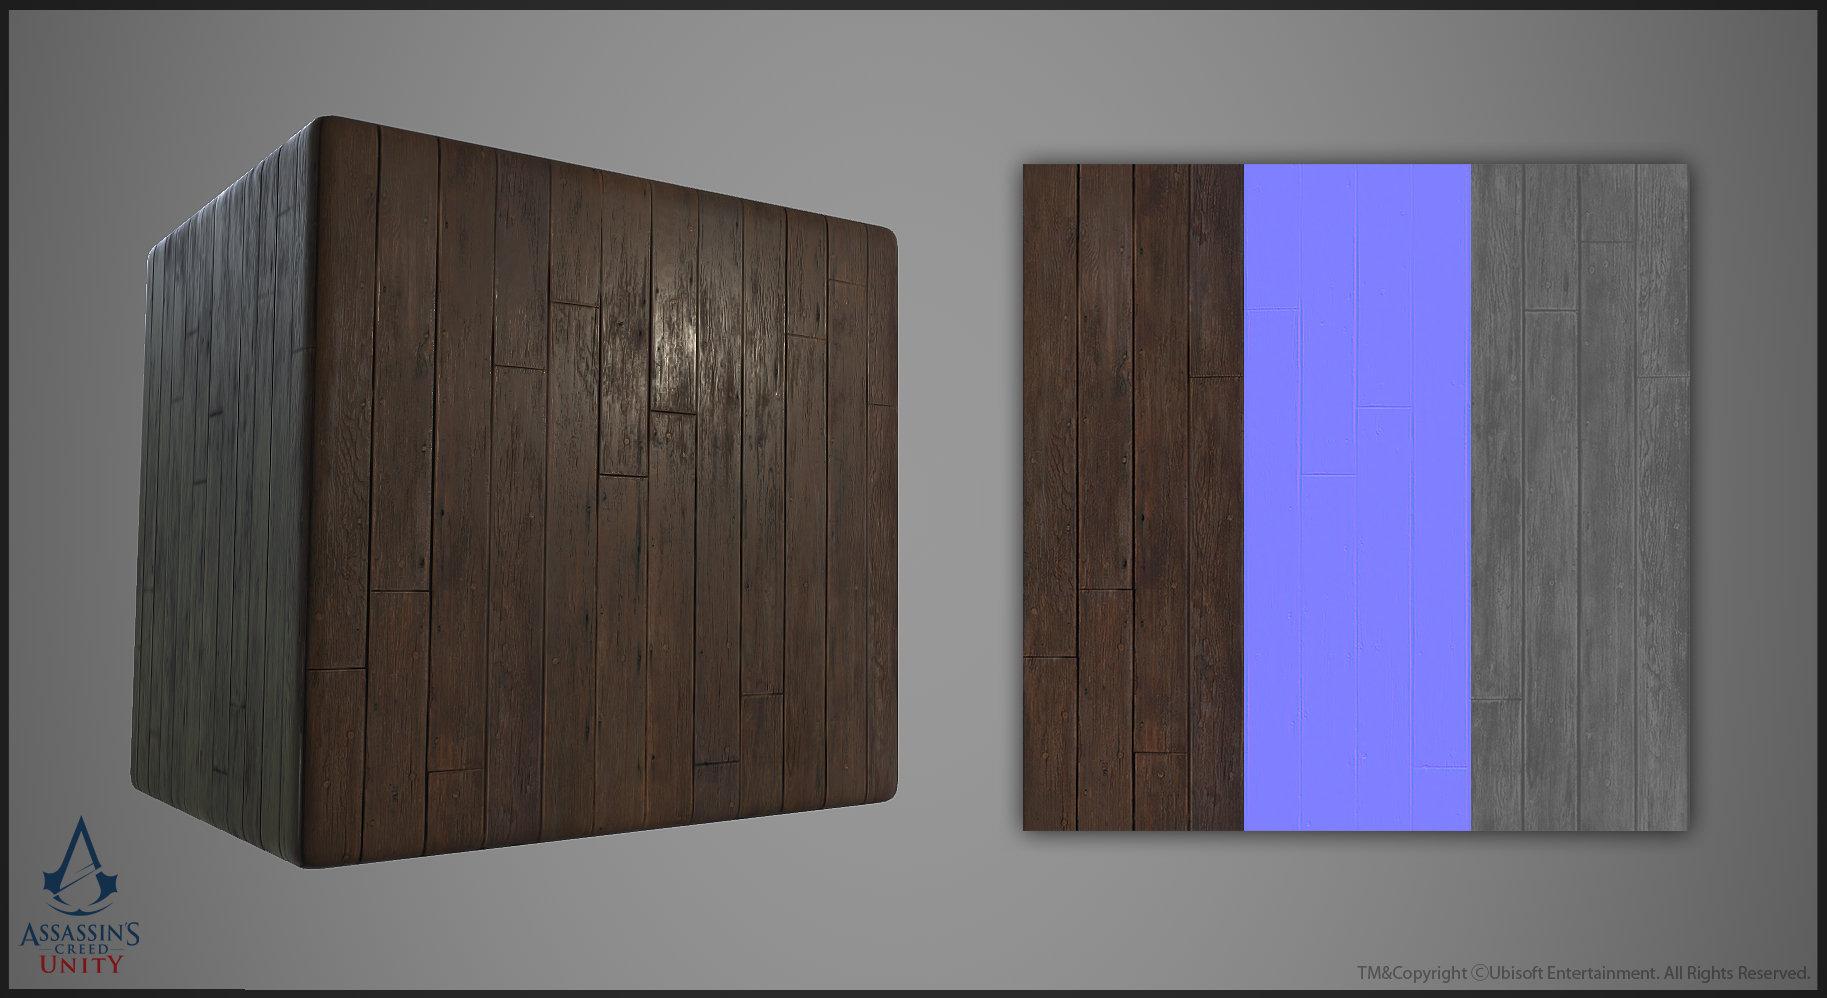 ArtStation - Assassin's Creed Unity Texture Set, Pierre FLEAU